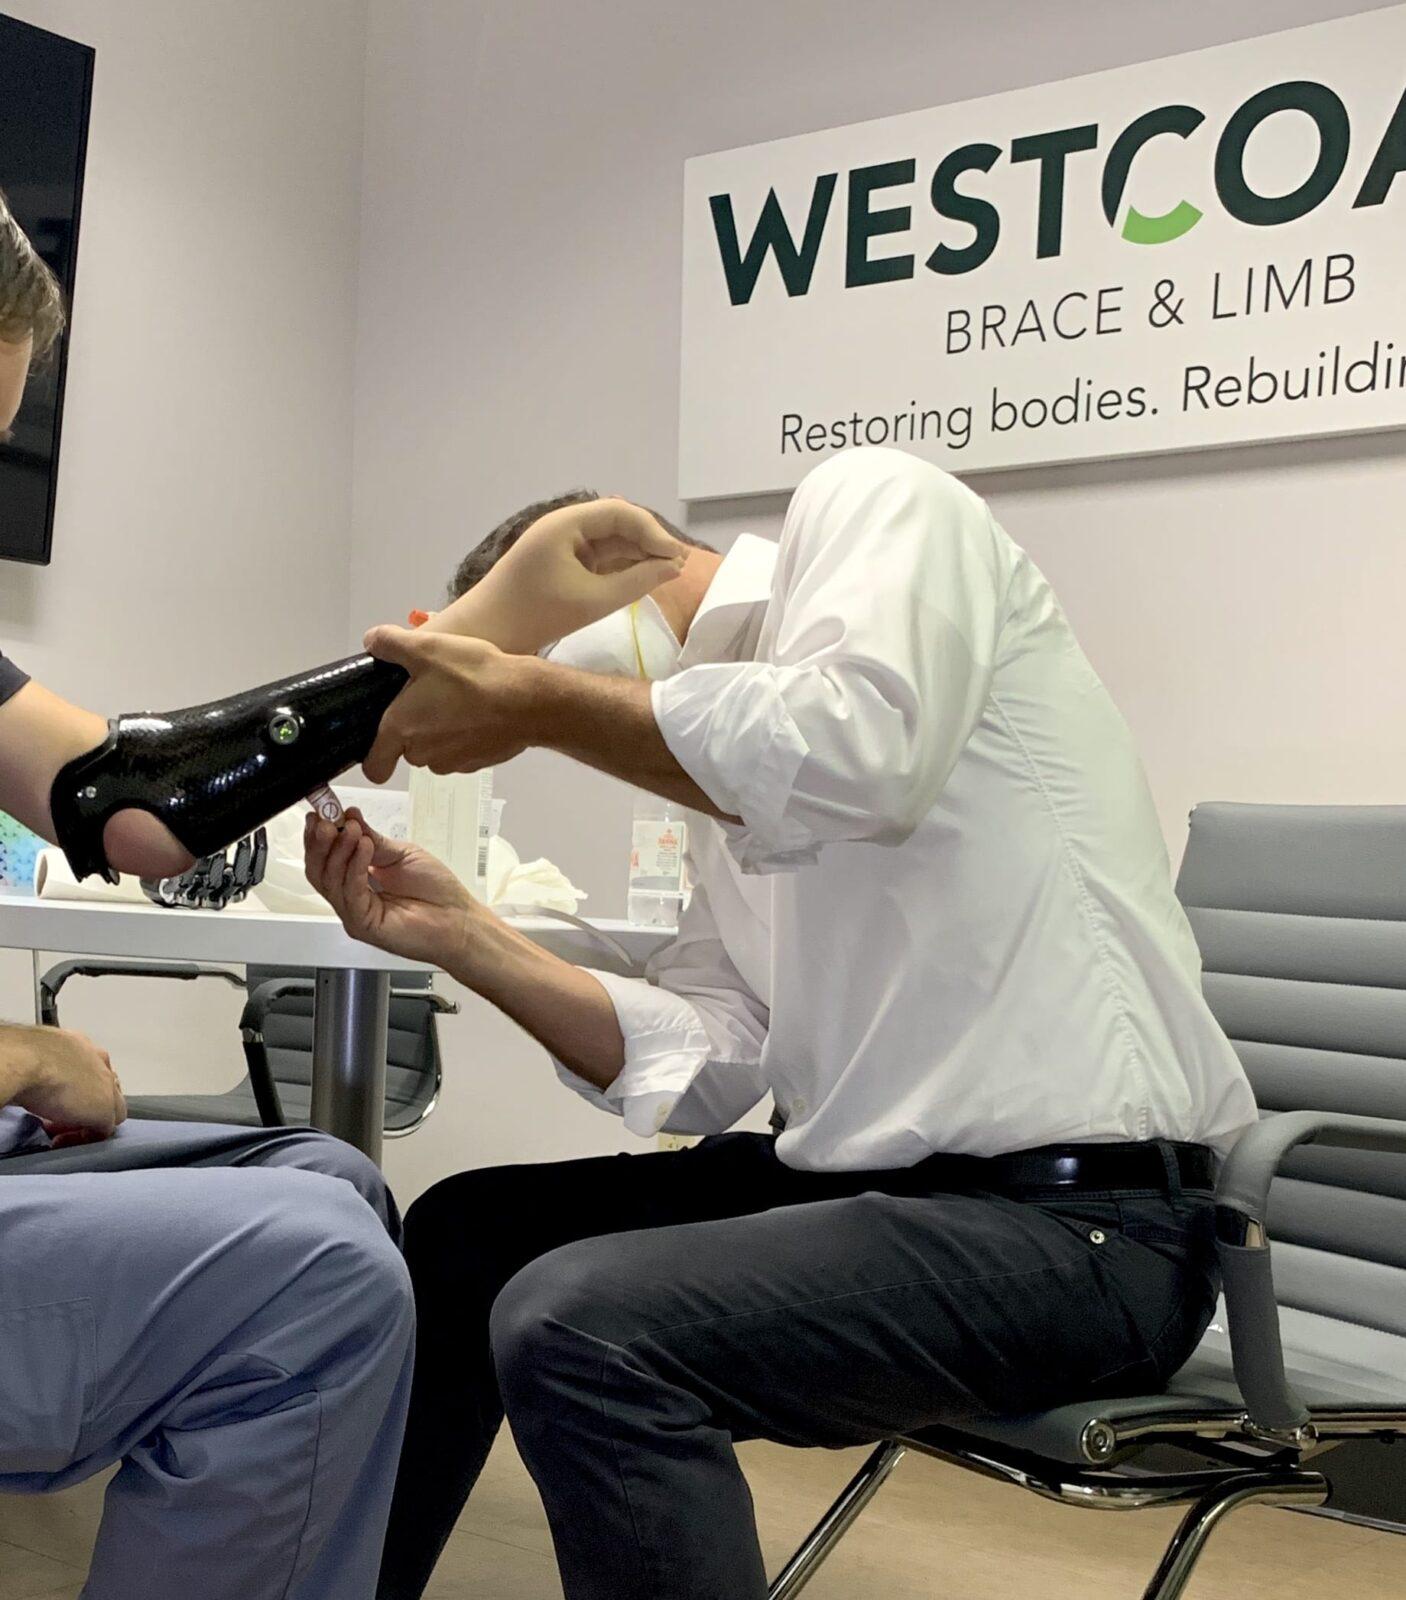 Prosthetist adjusting TMR patient's myoelectric prosthetic arm